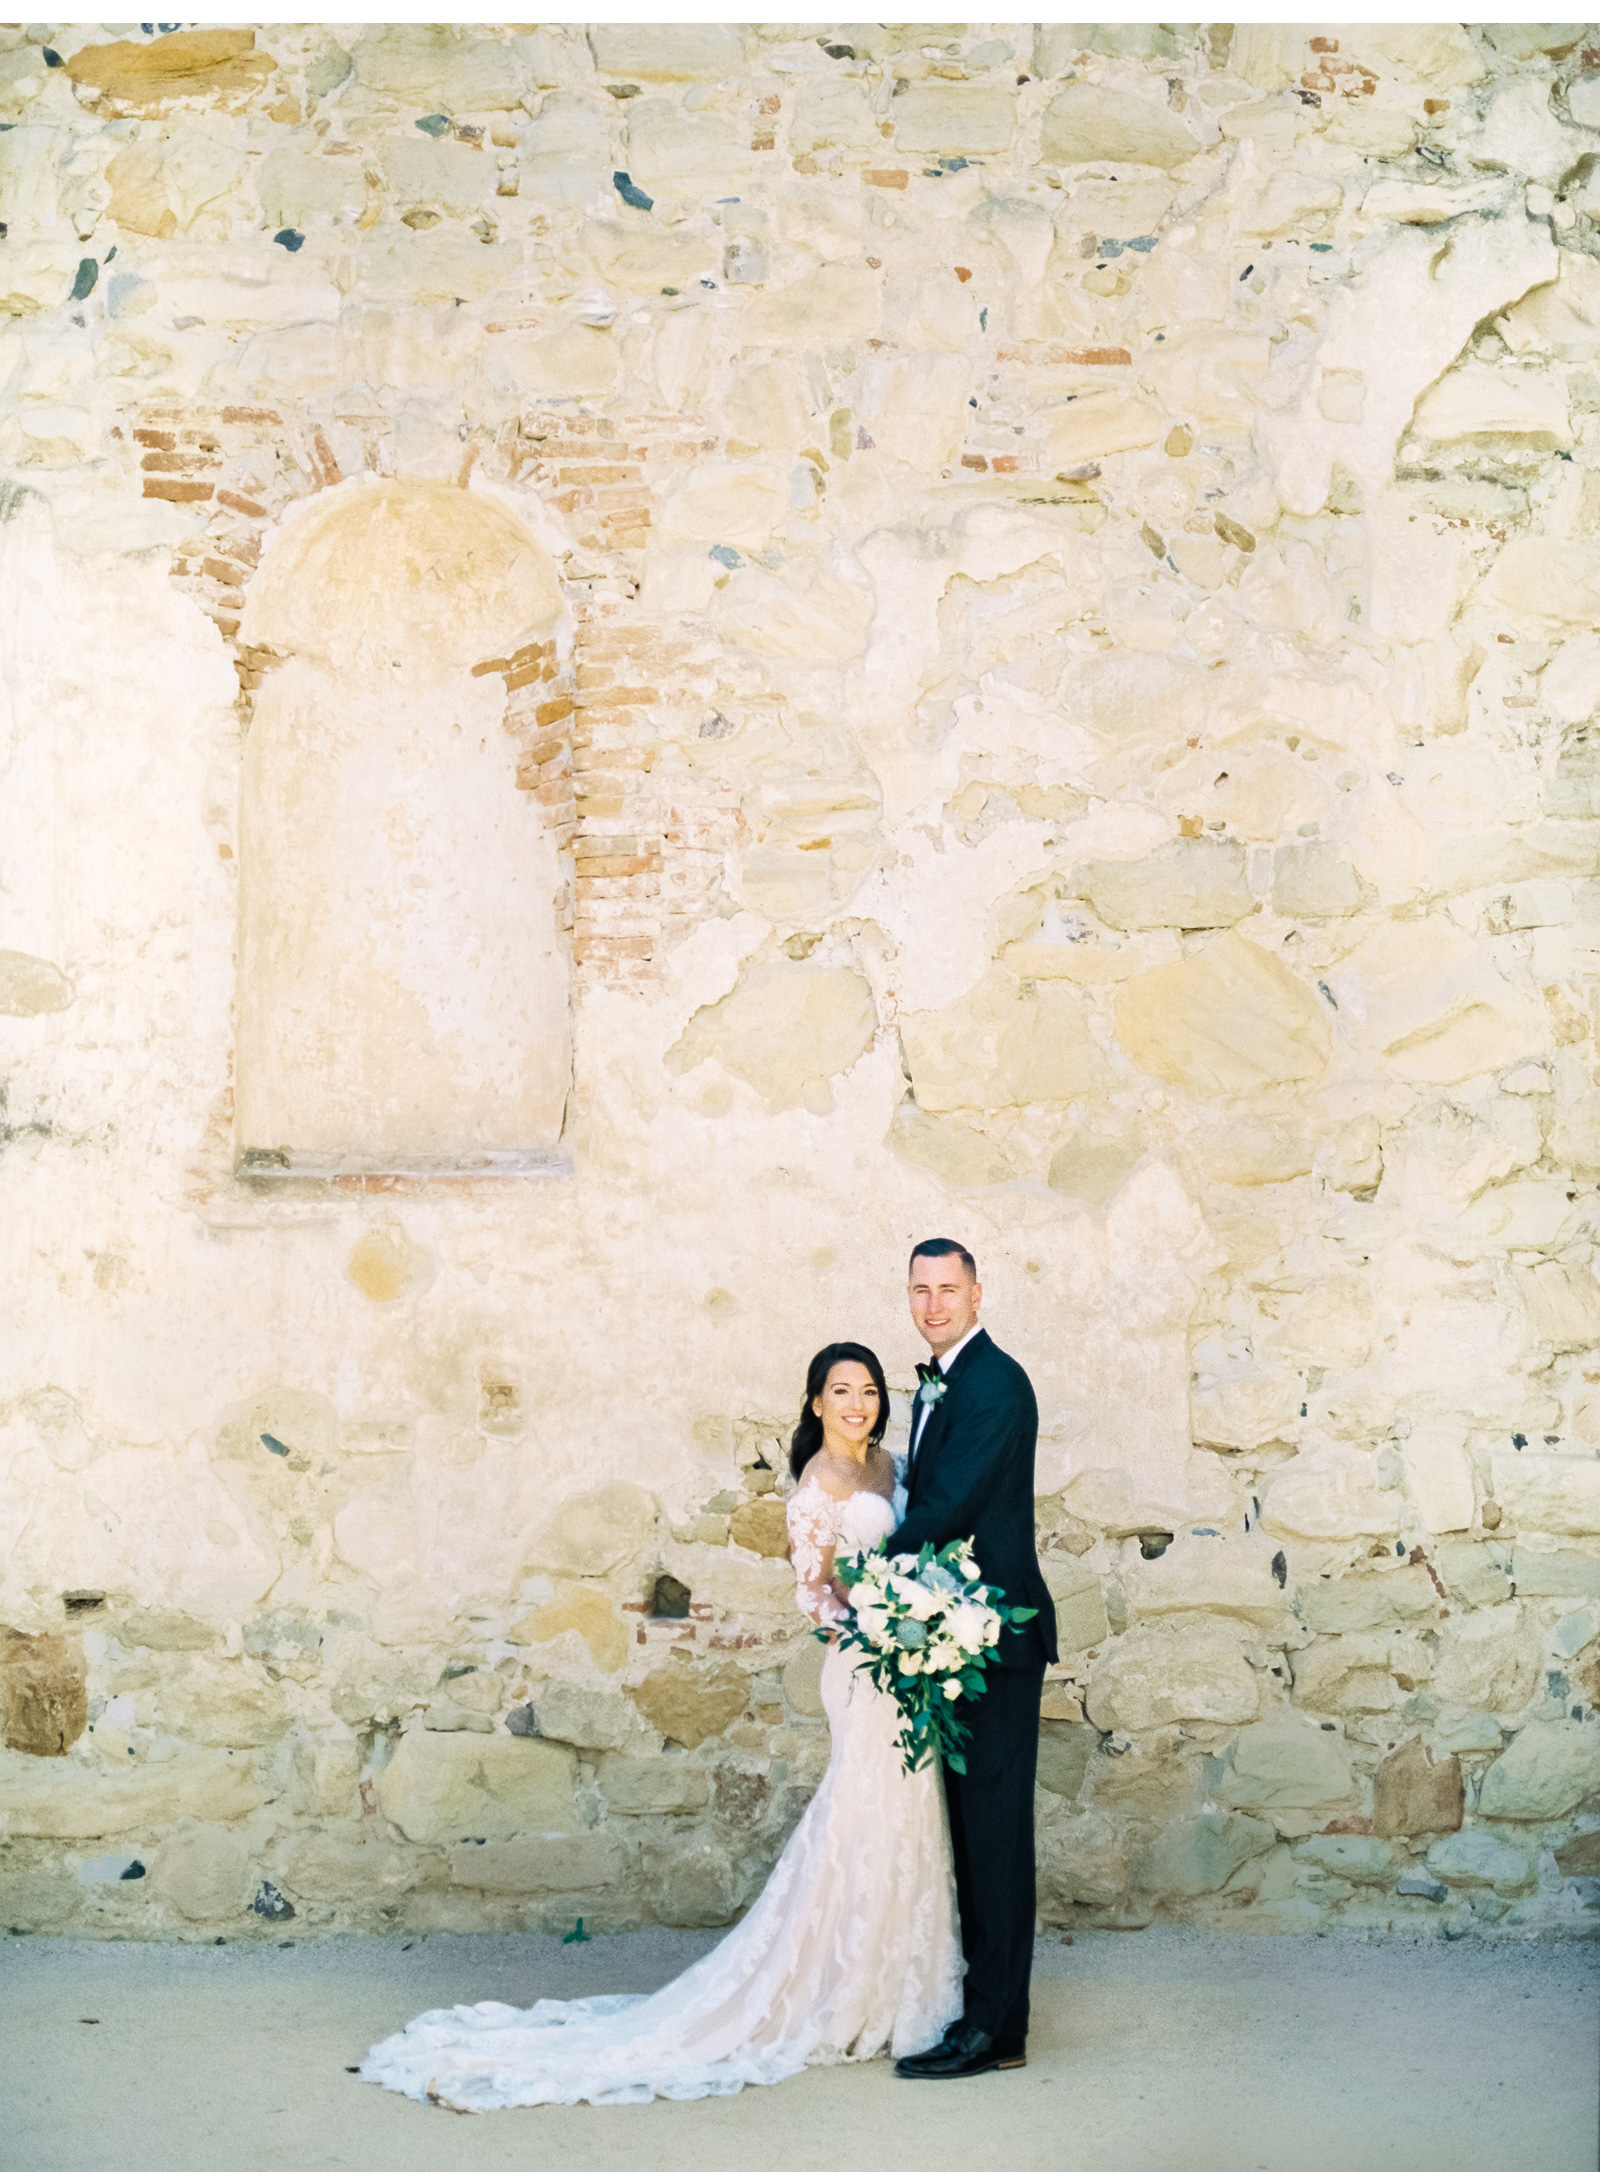 Southern-California-Weddings-Natalie-Schutt-Photography-Weddings_06.jpg